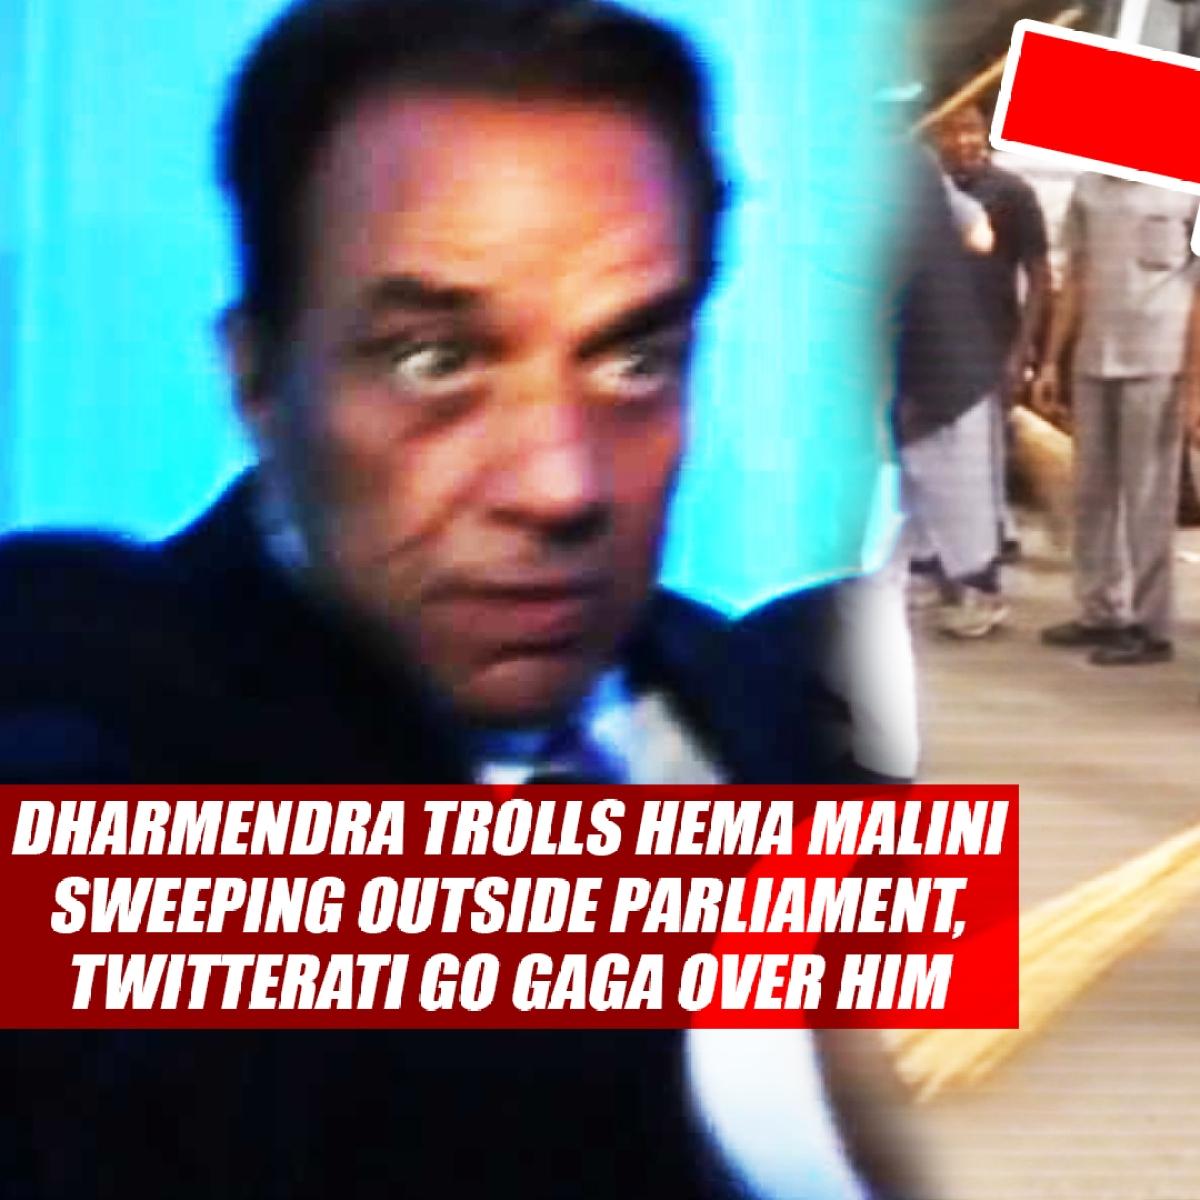 Dharmendra Trolls Hema Malini For Sweeping Outside Parliament, Twitterati Go Gaga Over Him